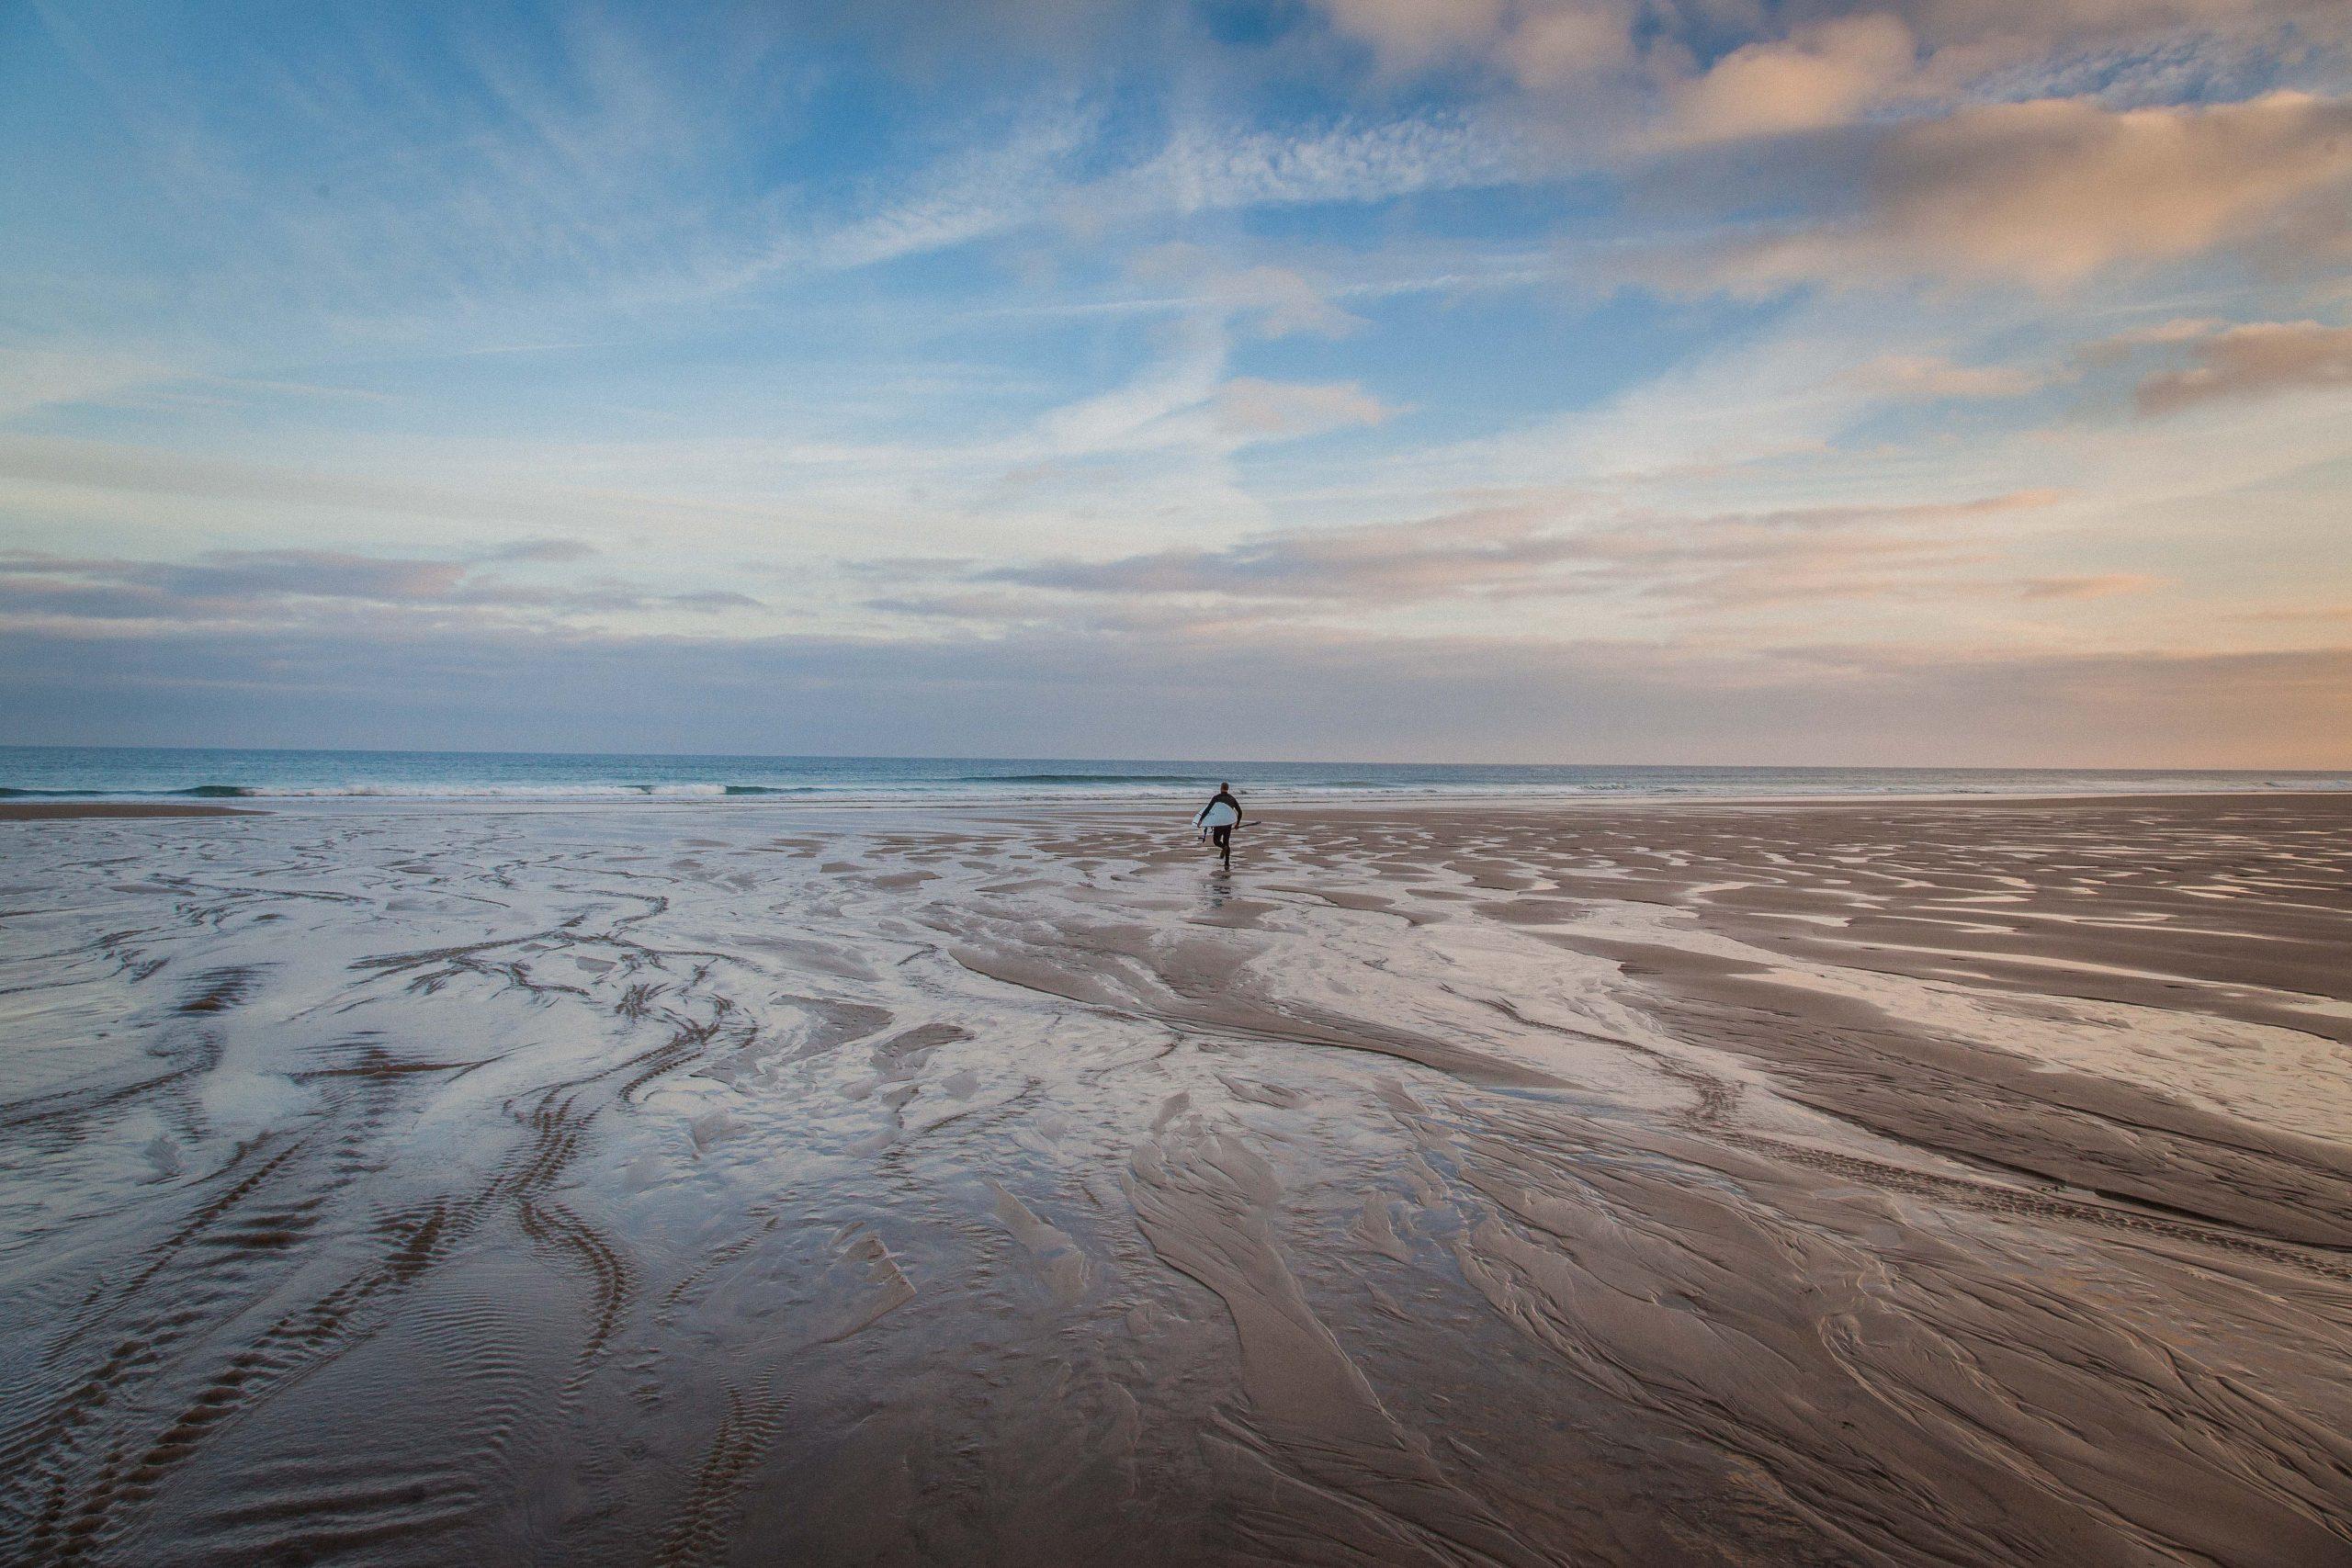 The lone surfer at Porthtowan, Cornwall